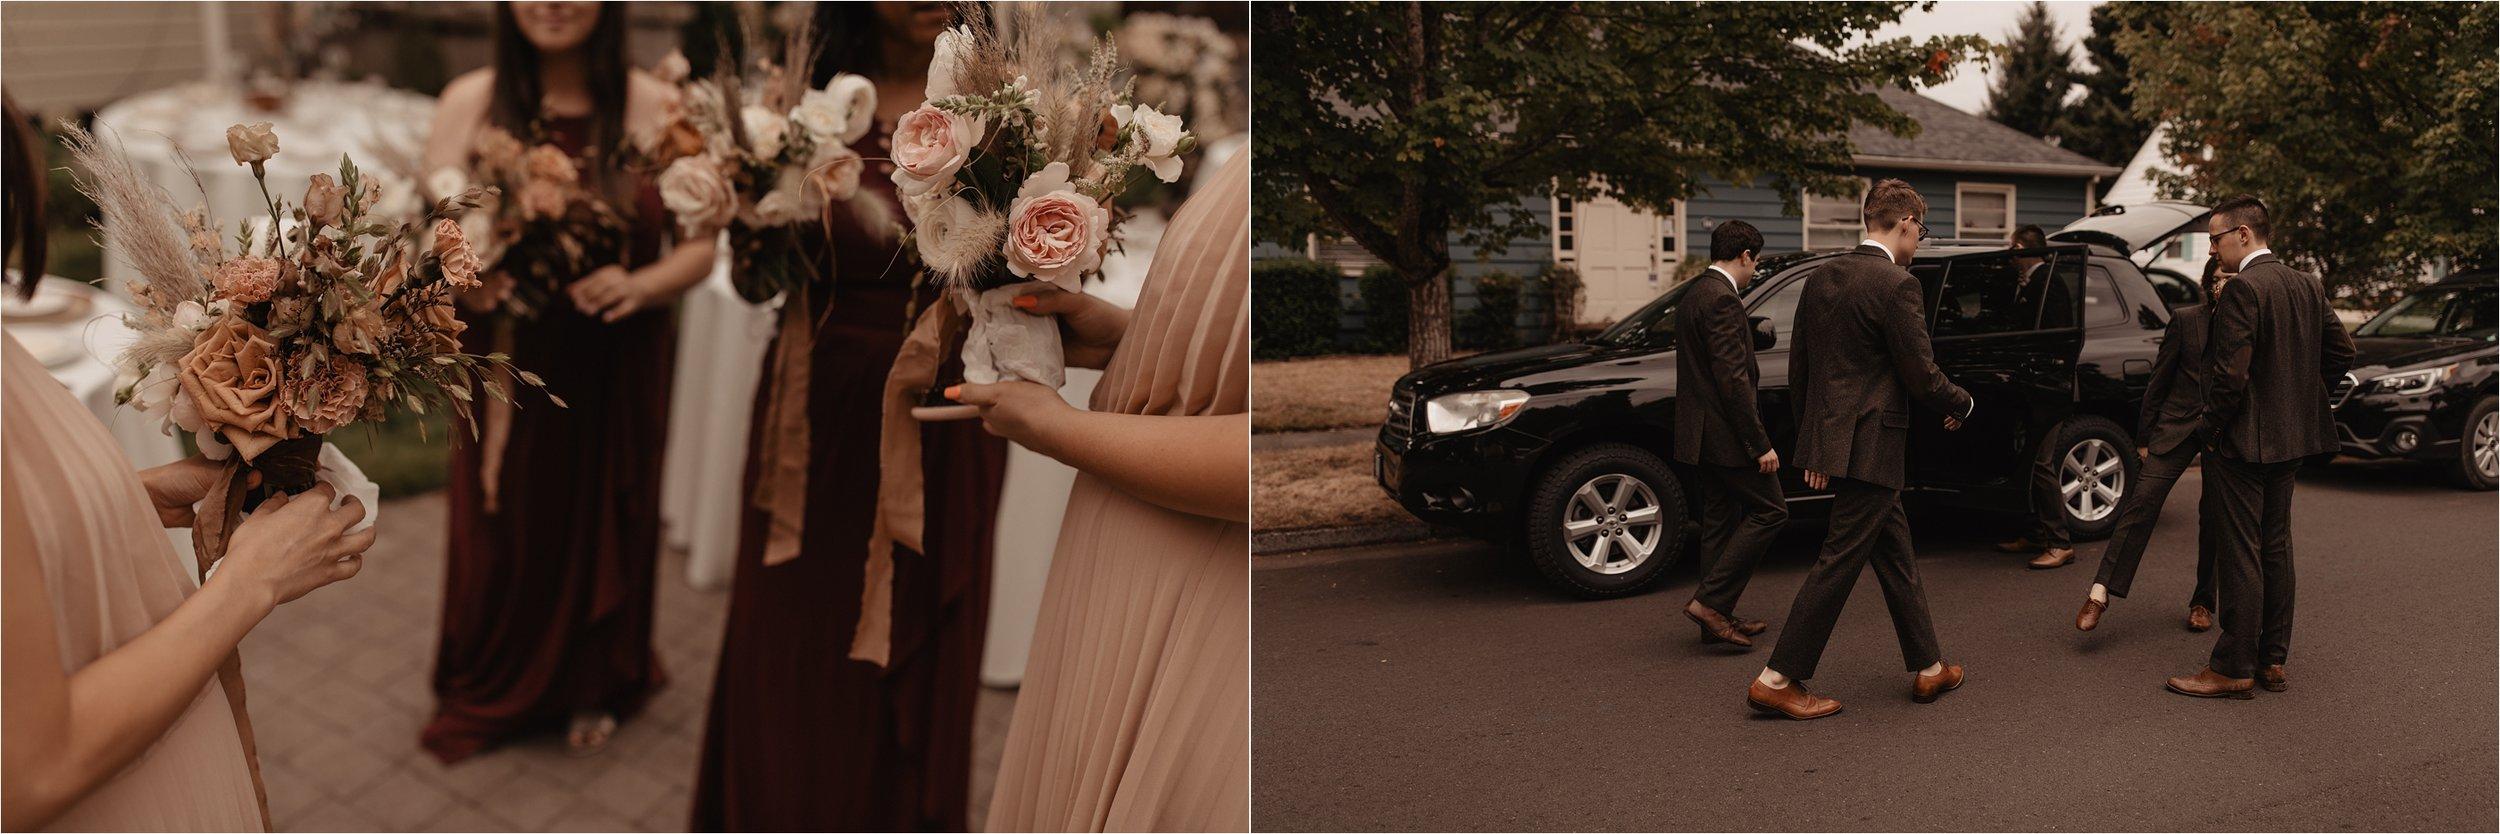 intimate-portland-modern-trendy-wedding_0026.jpg